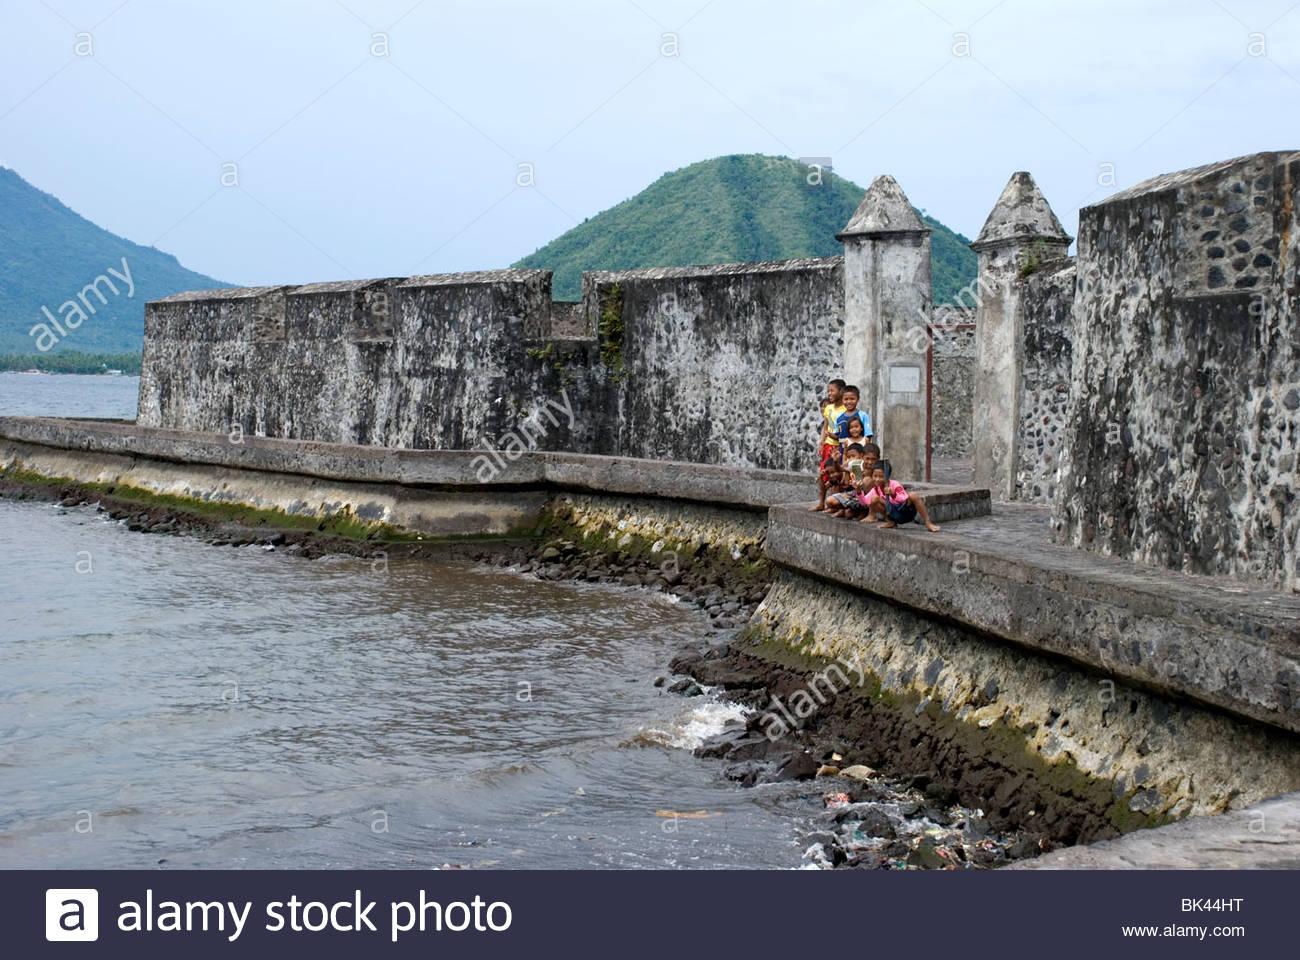 Benteng Kalamata Indonesia View Kota Ternate Stock Photo Royalty Free